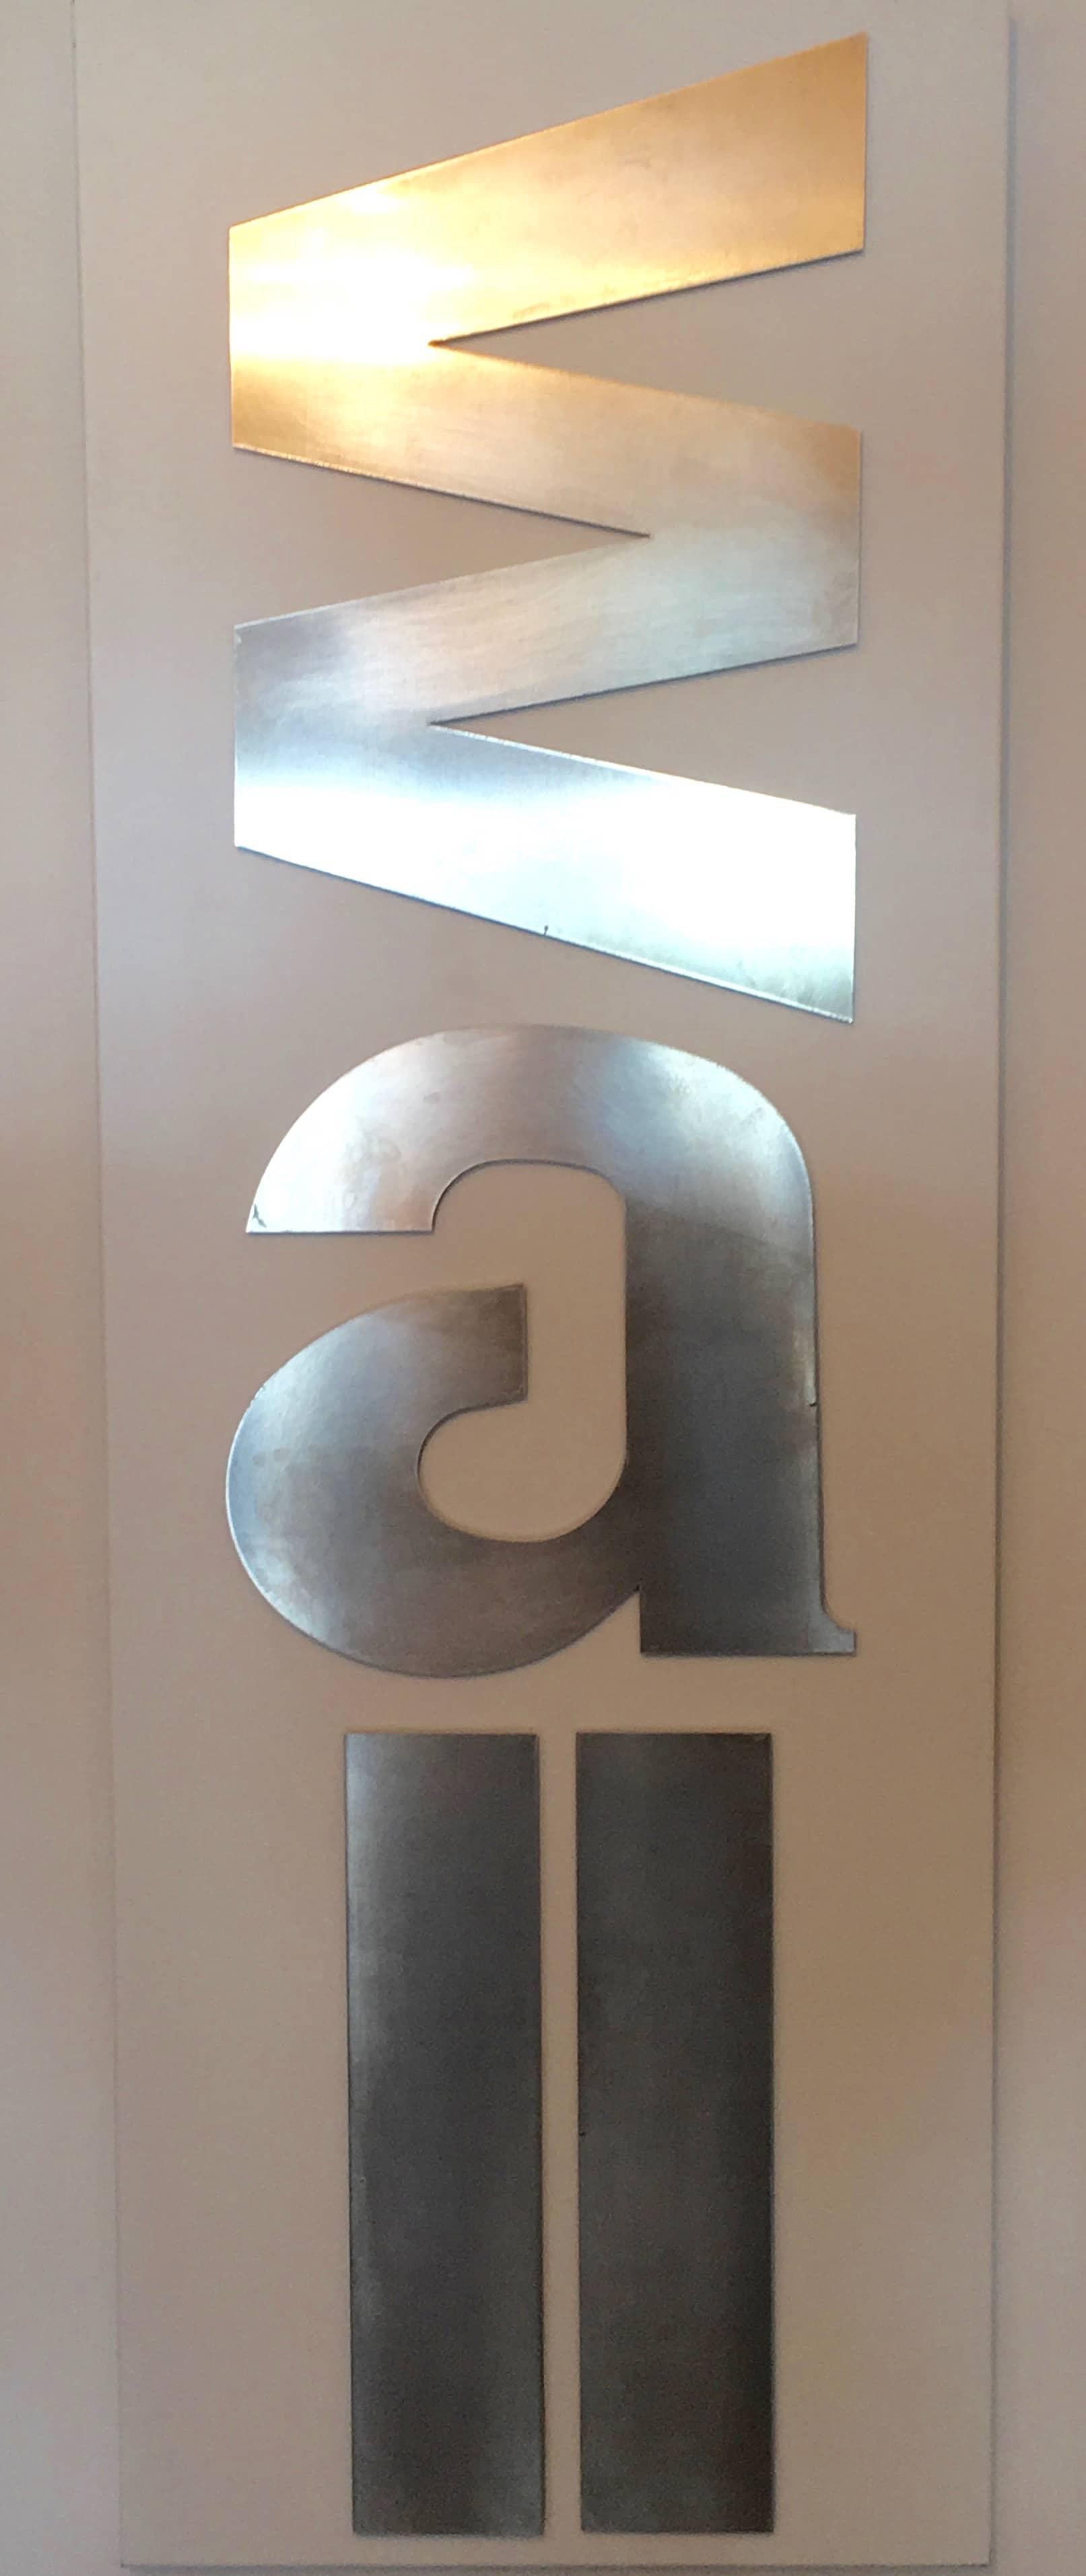 Aluminum sheet metal, design logo company sign, letter, letters